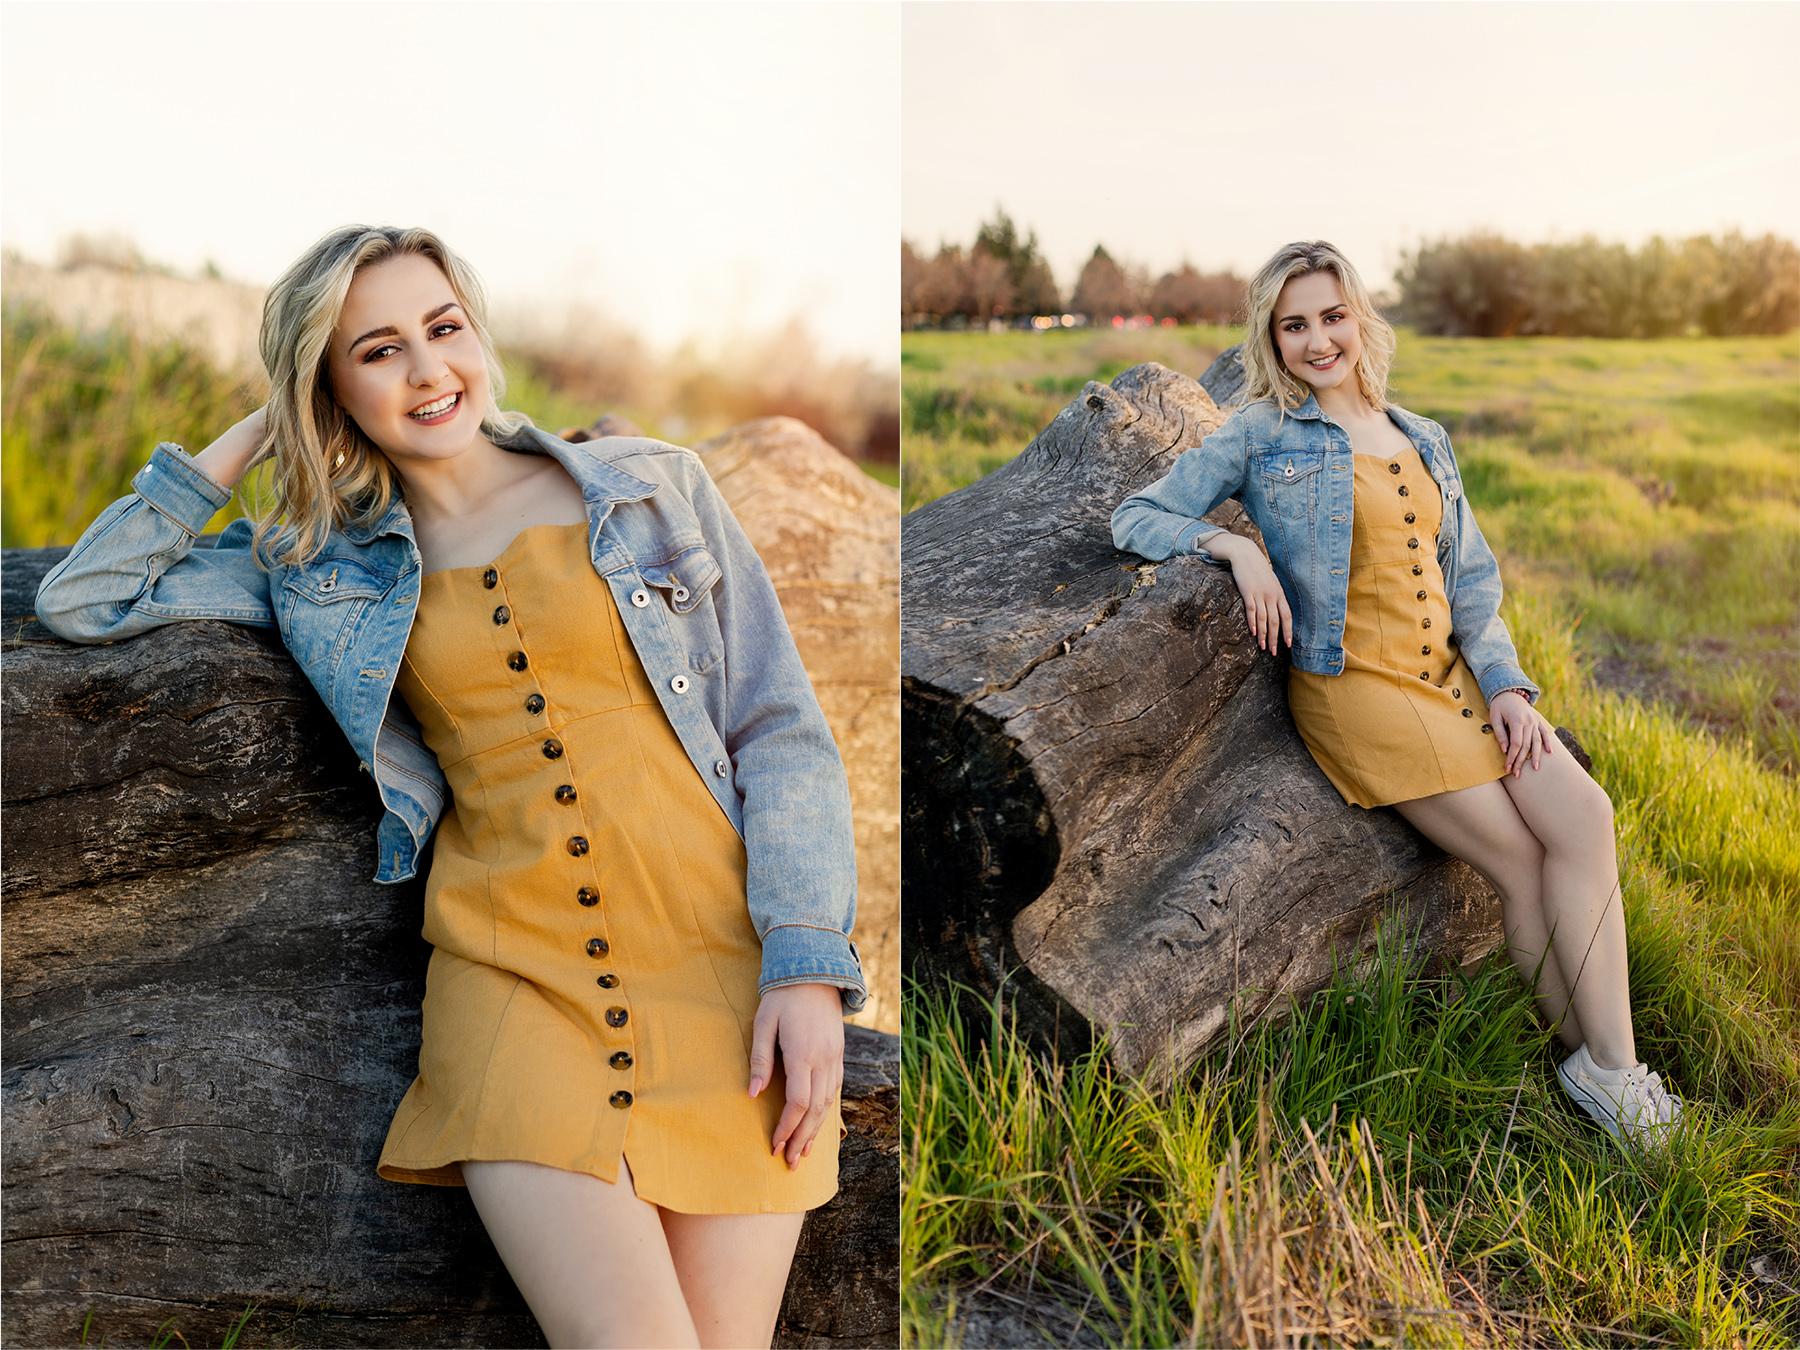 Summer-Inspired Senior Photoshoot with Mayumi Acosta Photography in Sacramento CA.jpg